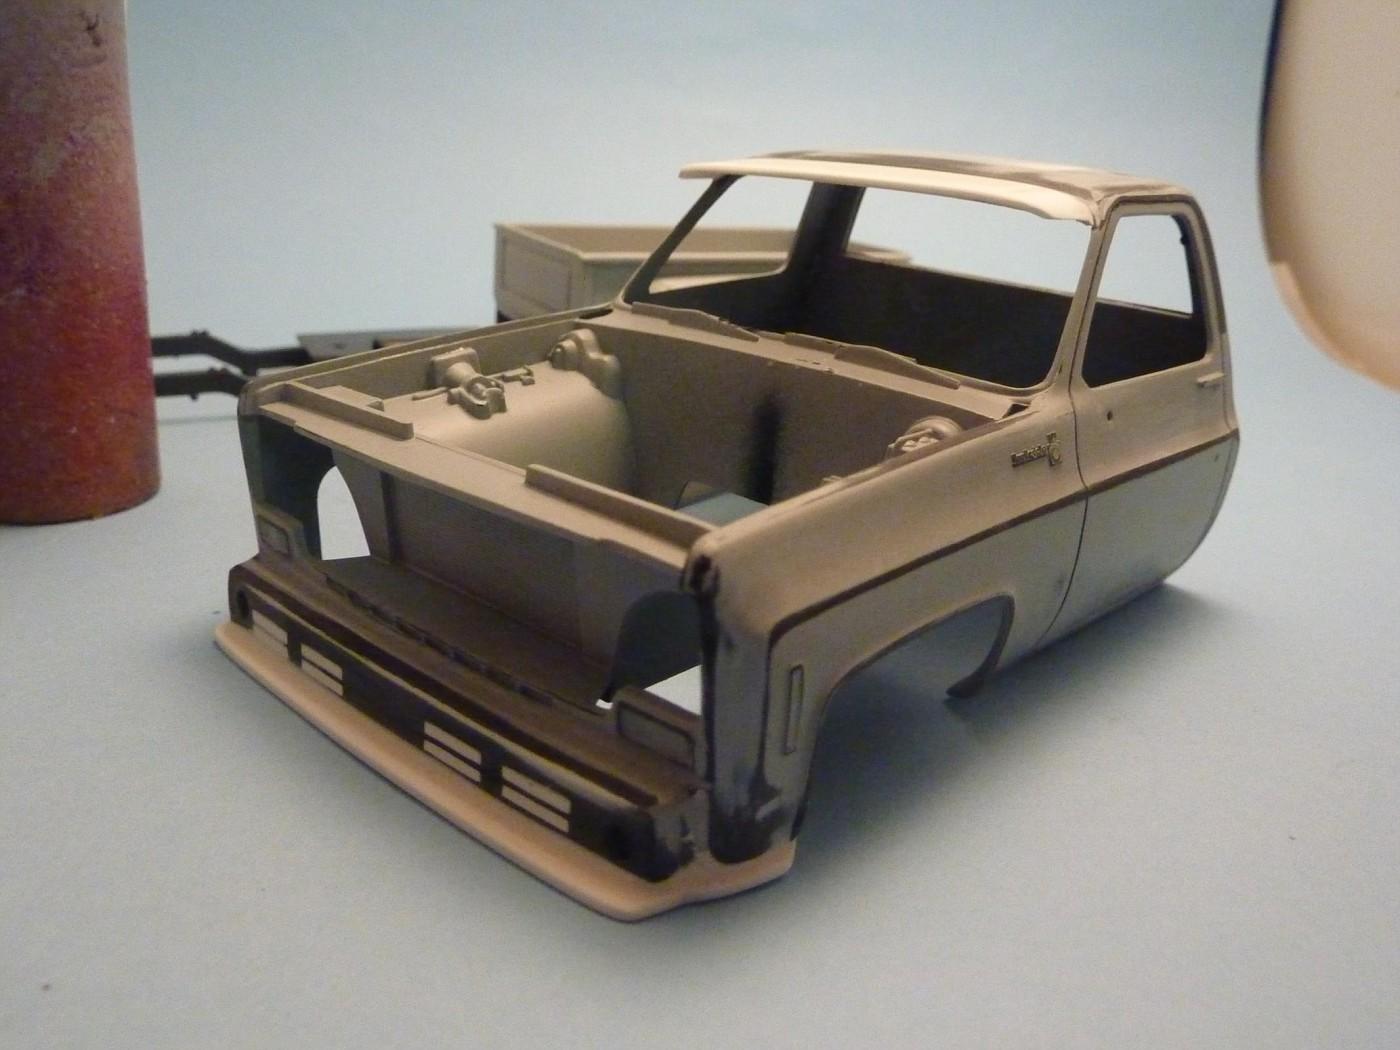 Chevrolet C 10 Pickup [Terminé] - Page 2 Photo7-vi